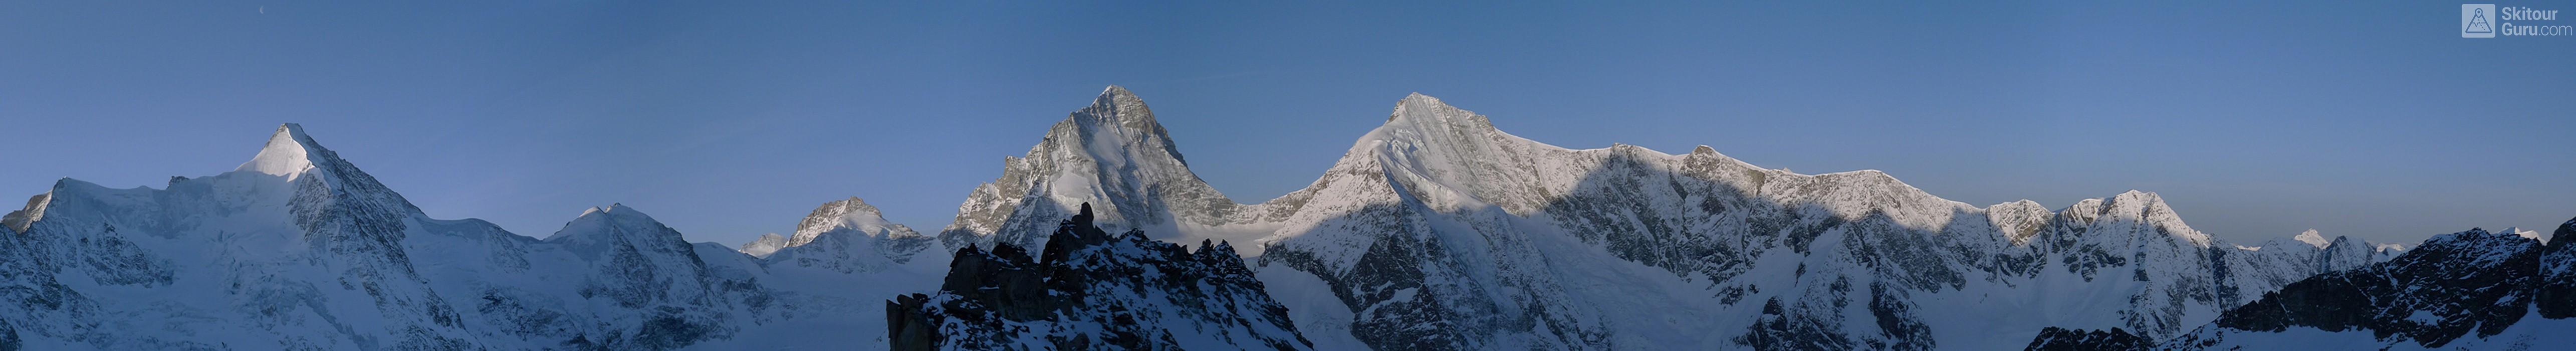 Cabane du Mountet Walliser Alpen / Alpes valaisannes Švýcarsko panorama 13